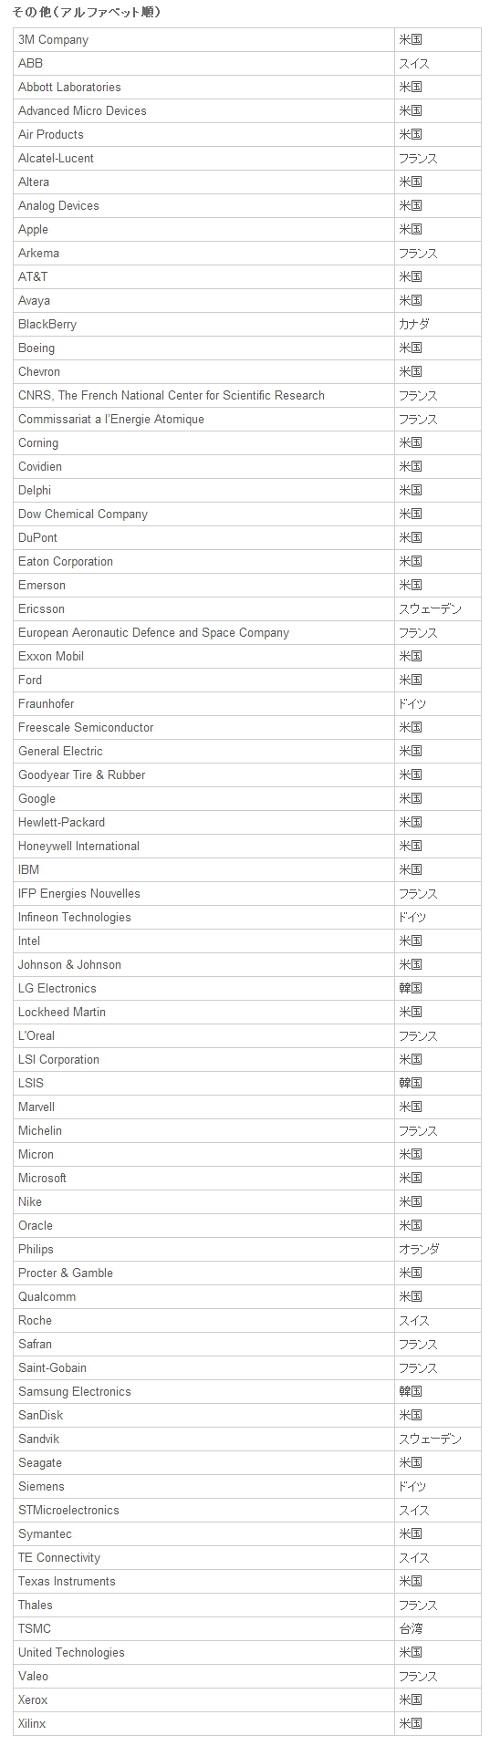 「Top 100 グローバル・イノベーター 2013」日本以外の受賞企業